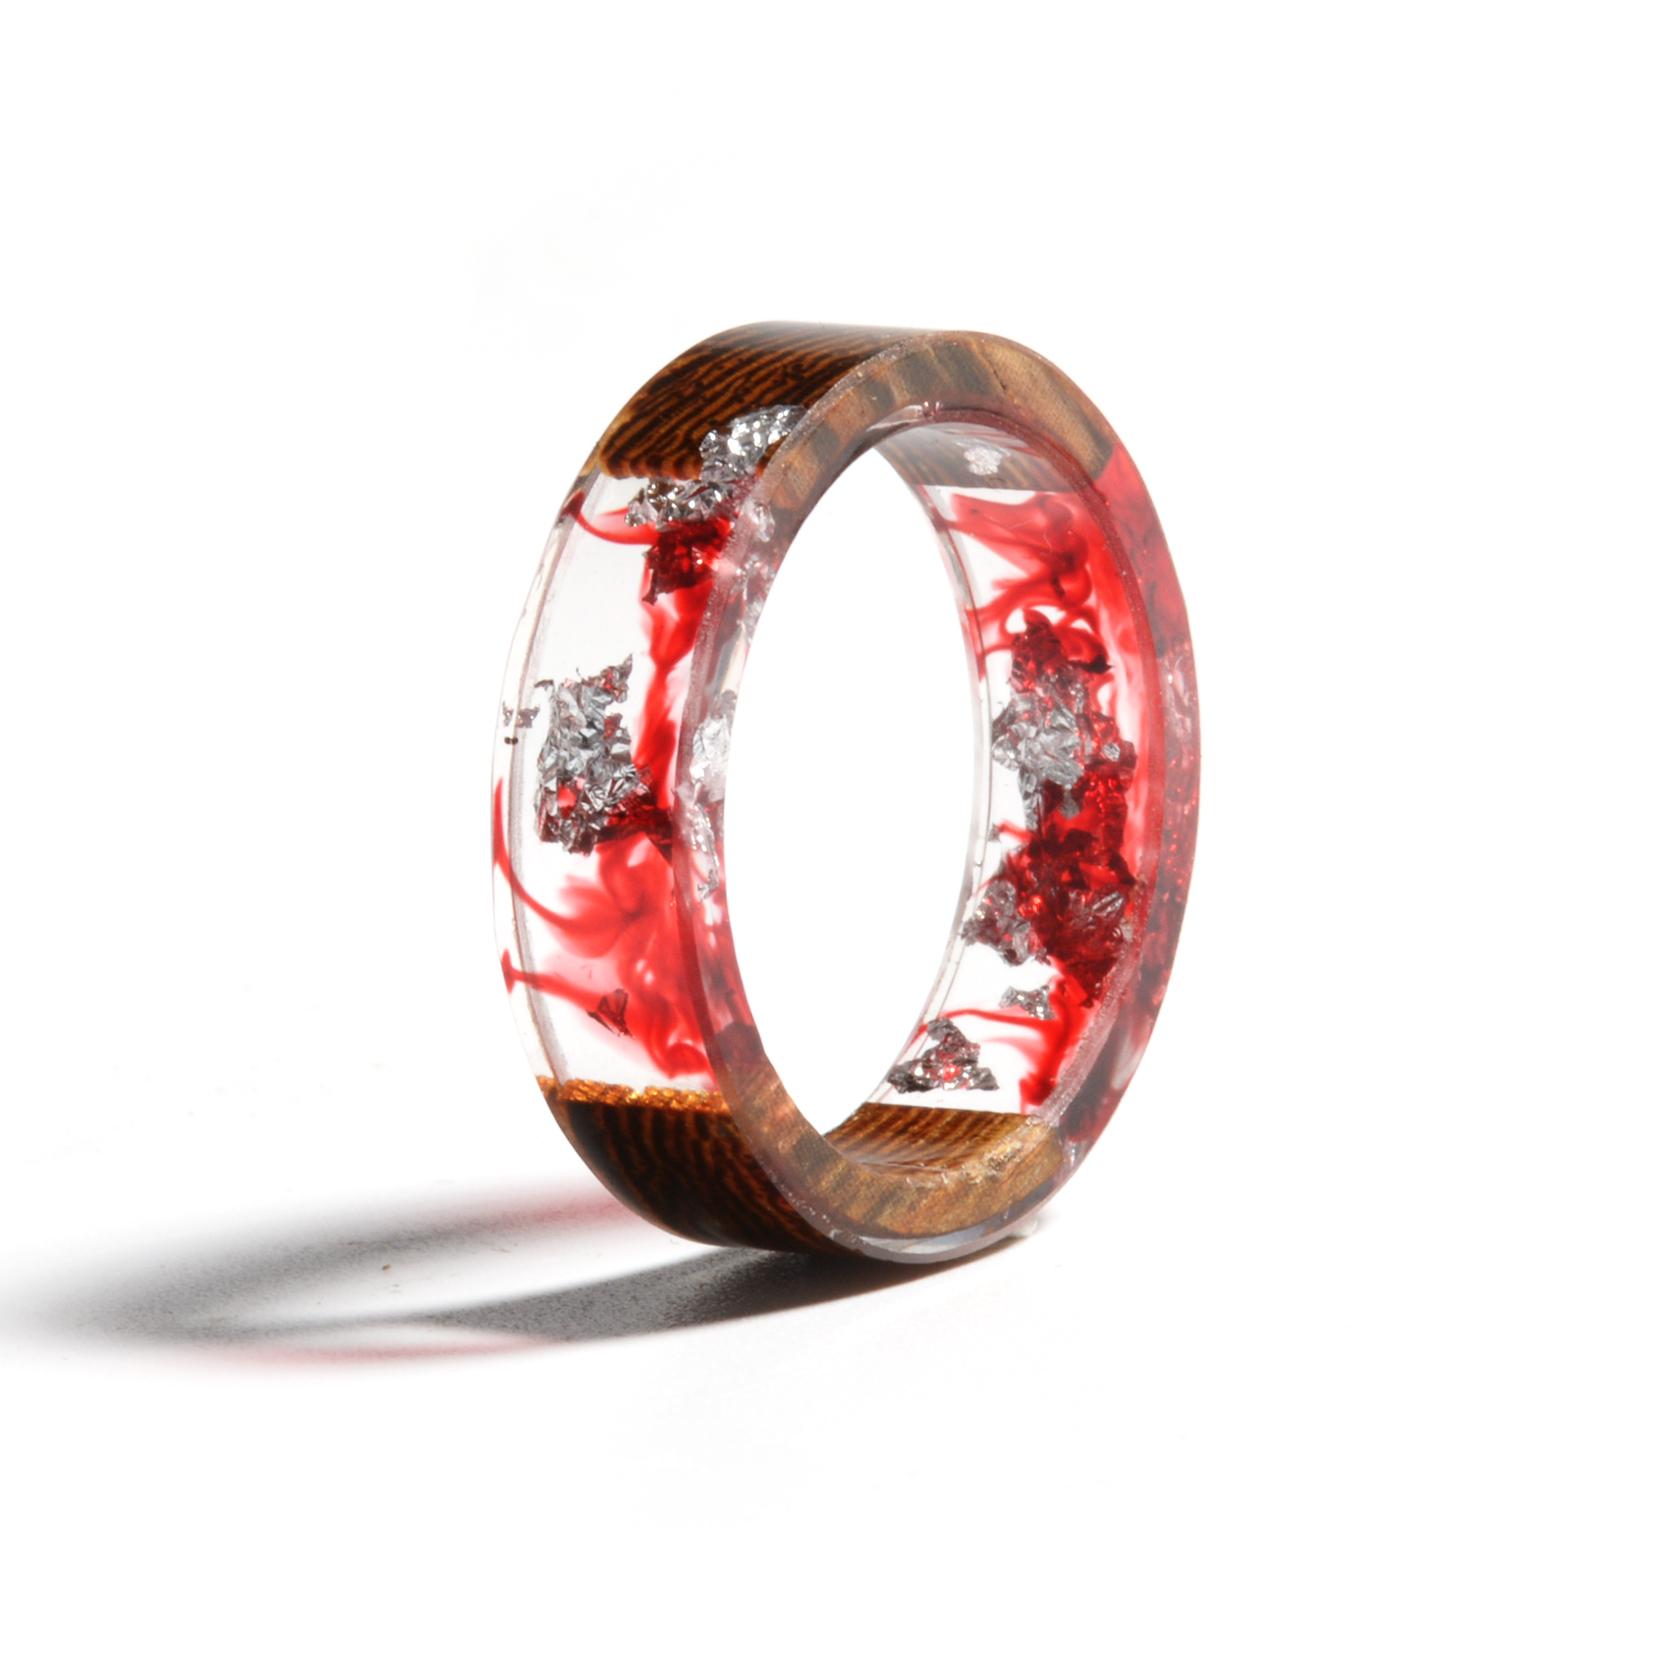 Clear Wood Resin Ring Handmade Dried Flower Hand Jewellery 14